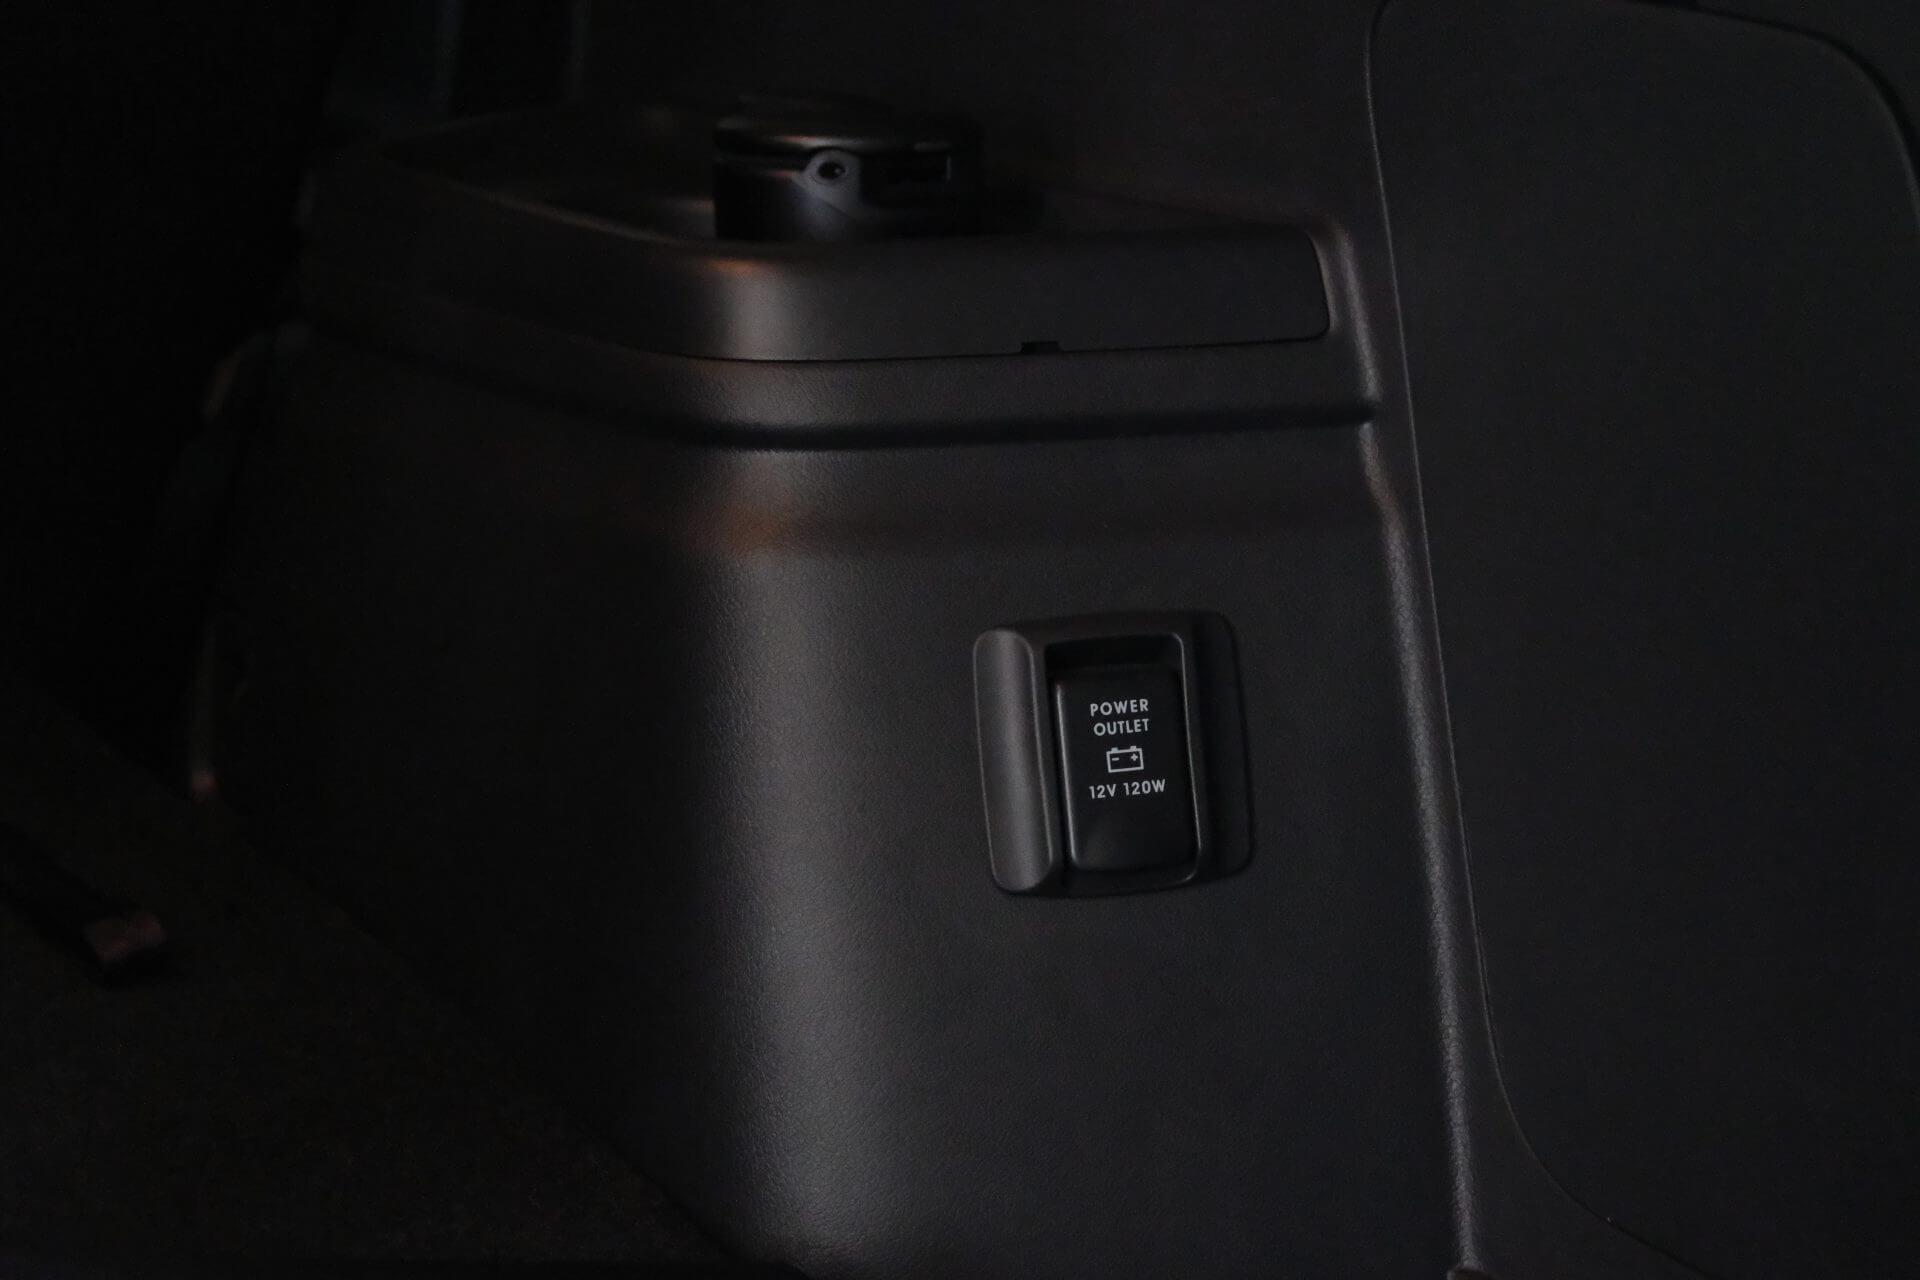 https://www.mitsubishi-motors.com.vn/w/wp-content/uploads/2020/02/DSCF3488.jpg